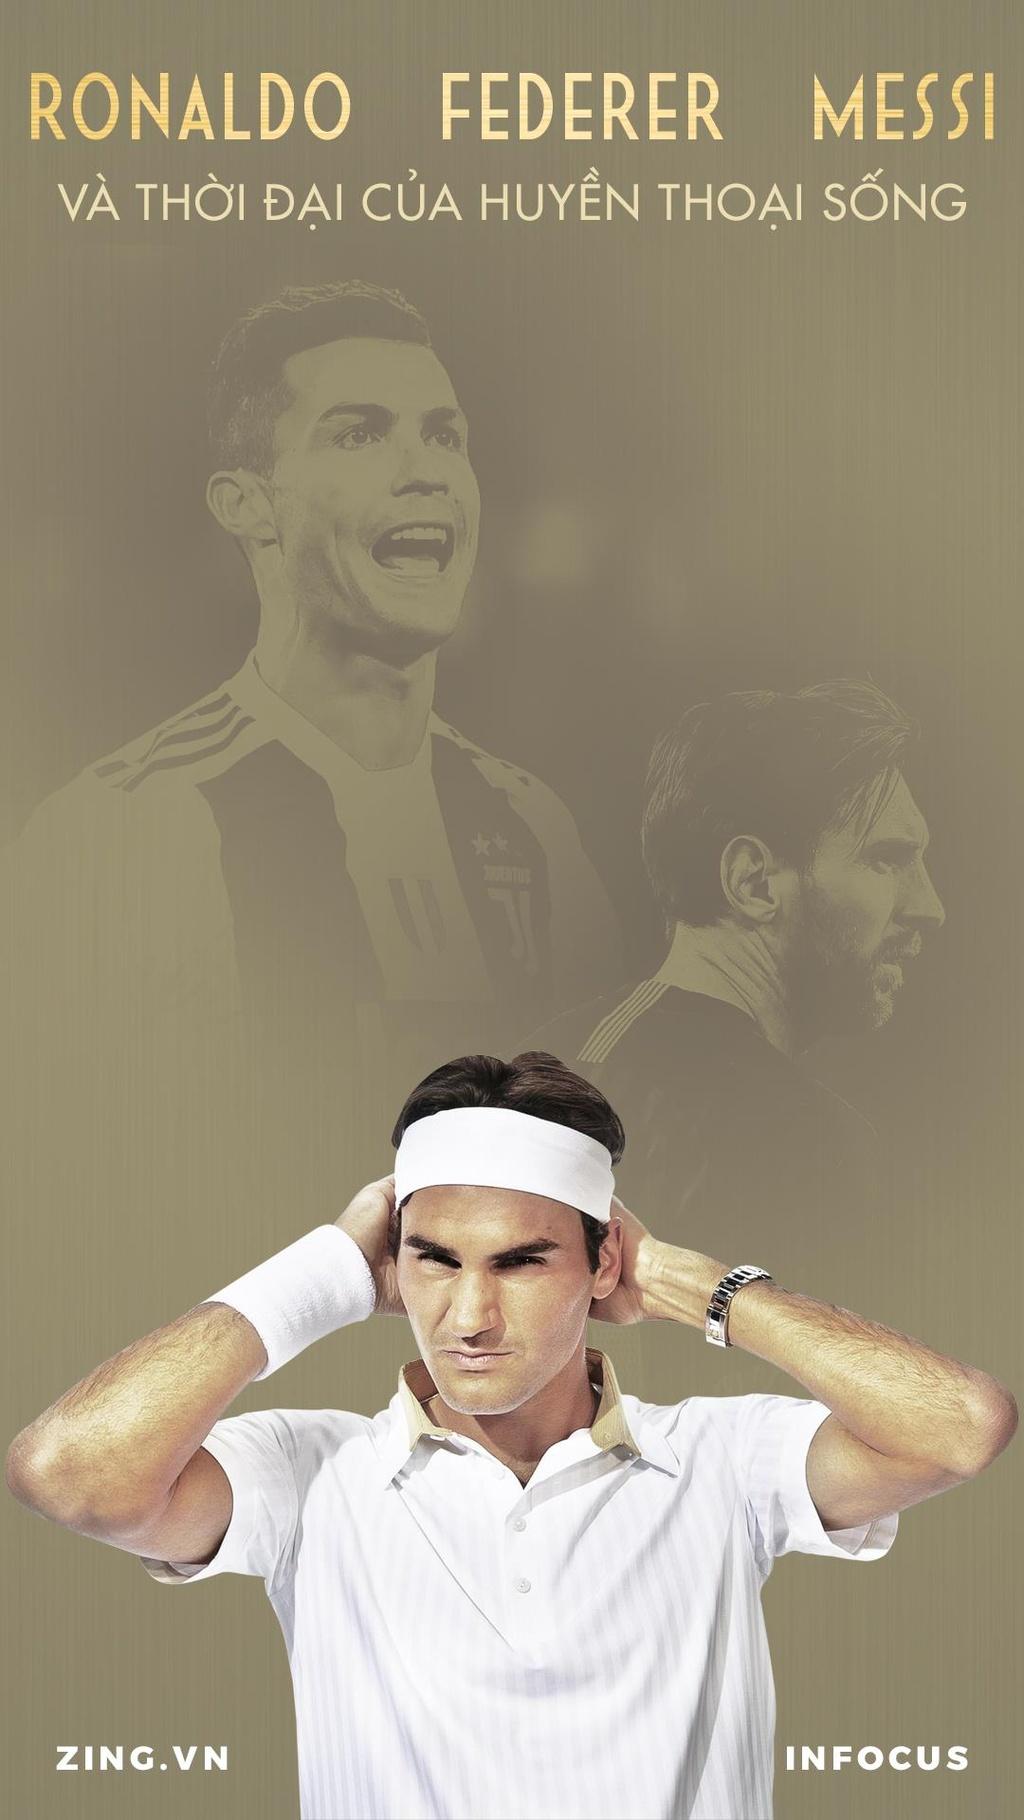 Federer, Ronaldo, Messi va thoi dai cua huyen thoai song hinh anh 1